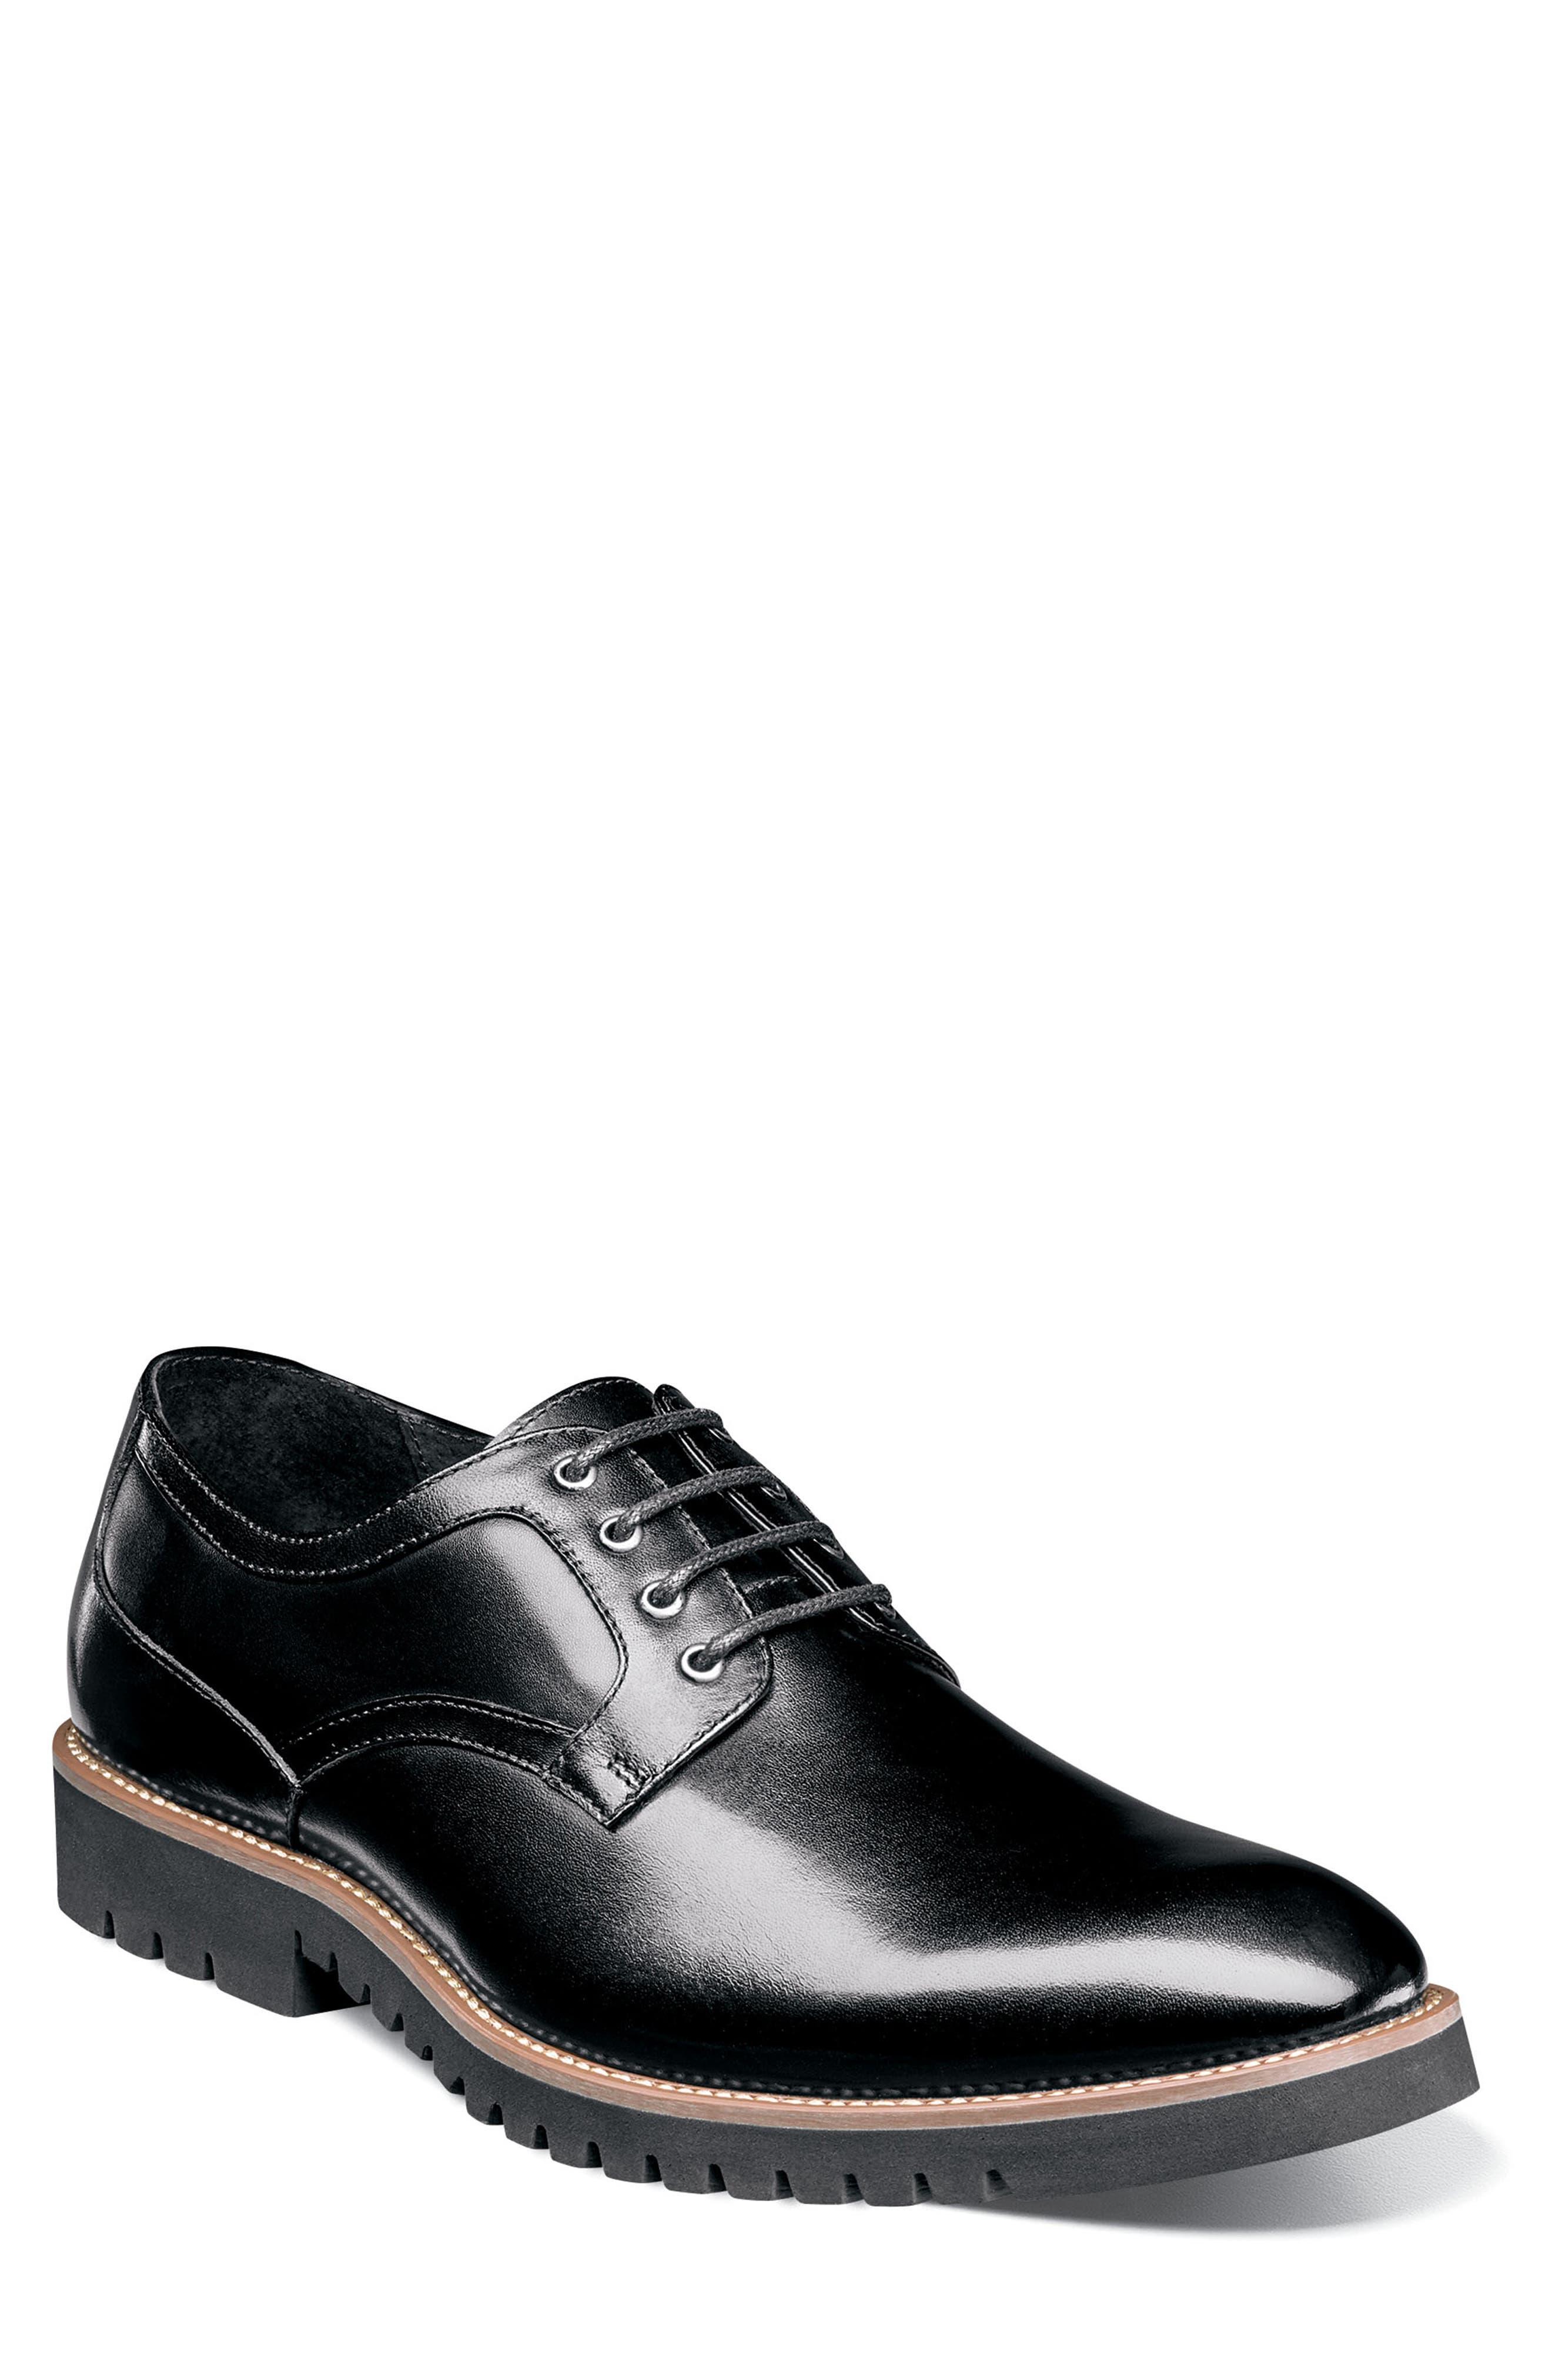 Barclay Plain Toe Derby,                             Main thumbnail 1, color,                             BLACK LEATHER